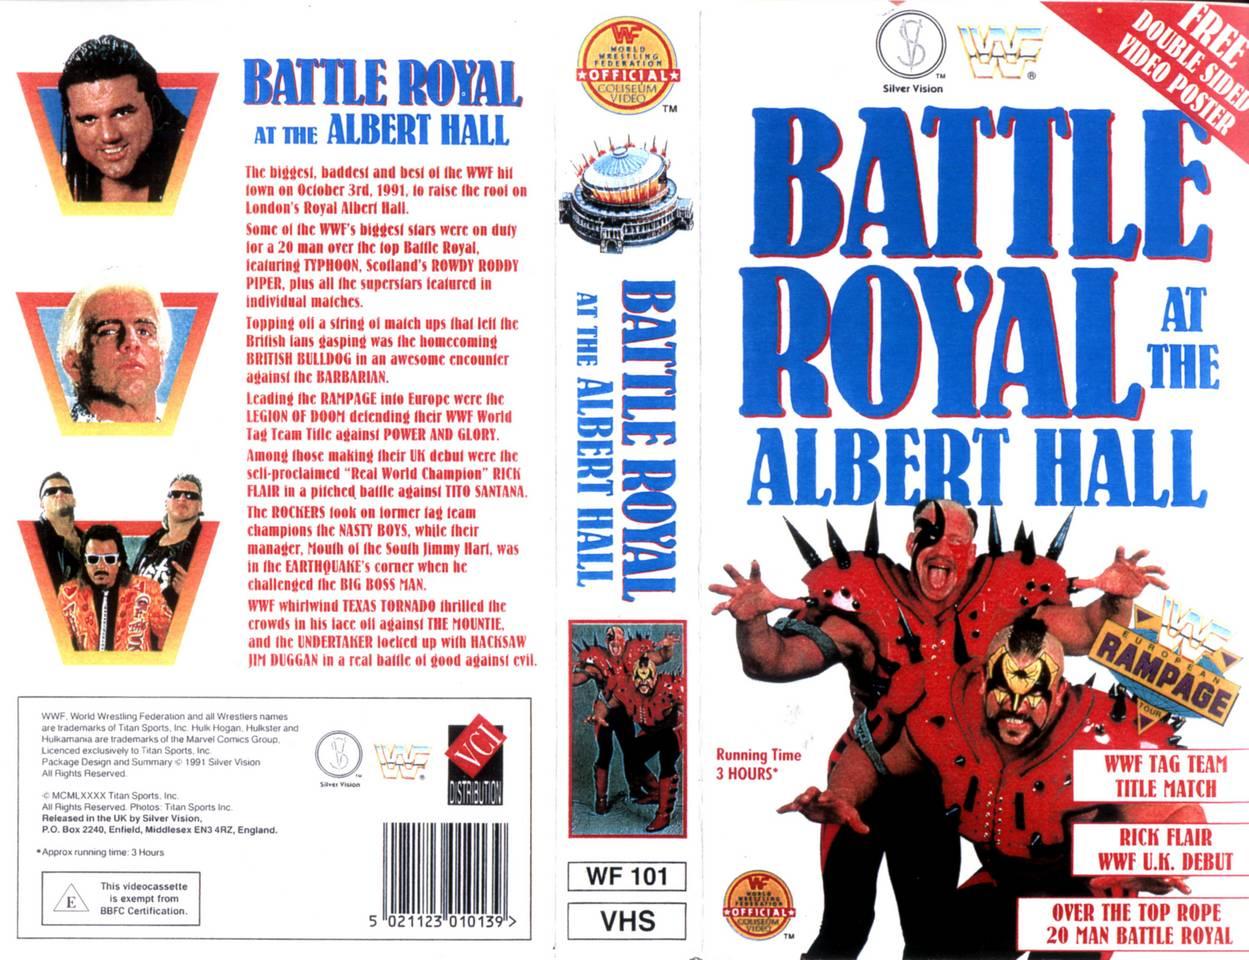 battleroyal913qz